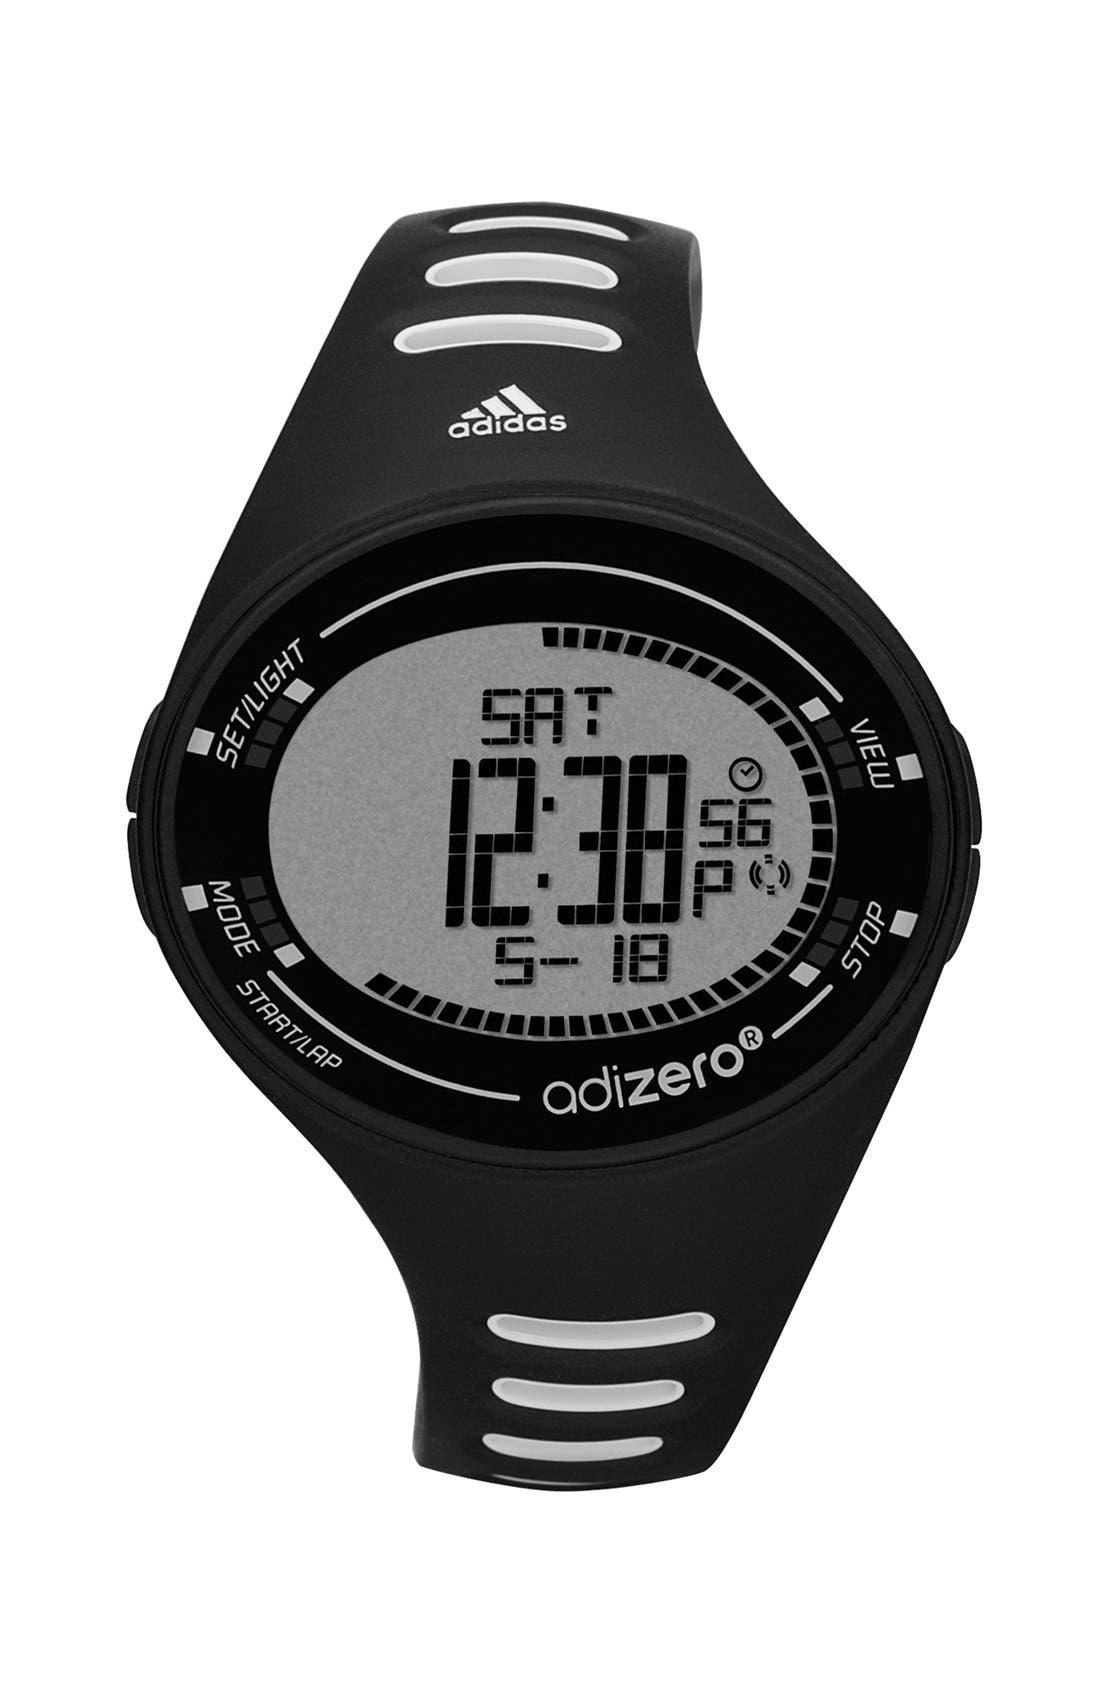 Main Image - adidas Performance 'adiZero' Digital Sport Watch, 42mm x 33mm